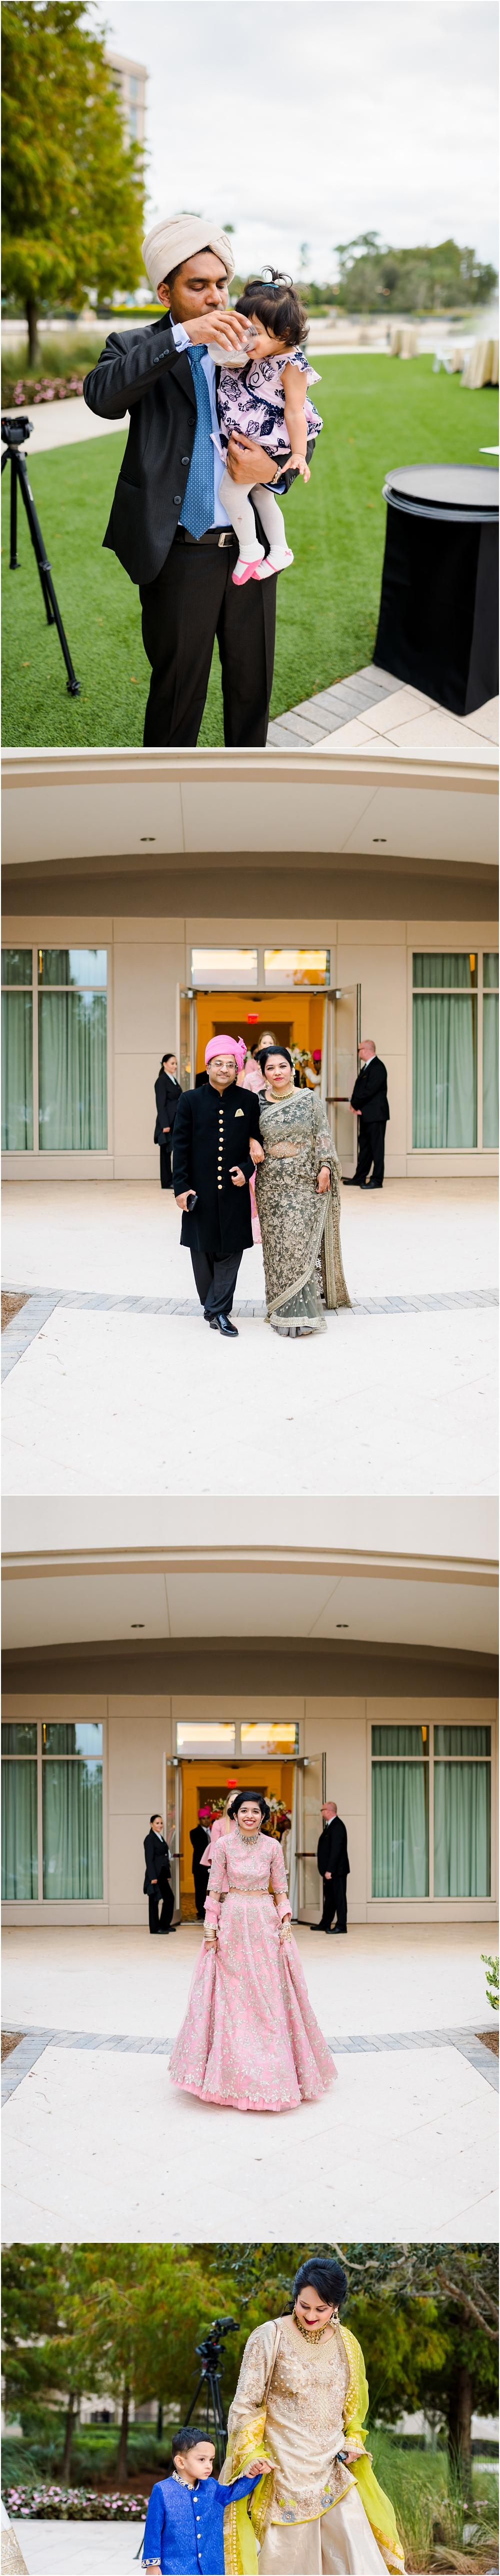 mukit-orlando-muslim-wedding-kiersten-stevenson-photography311.jpg